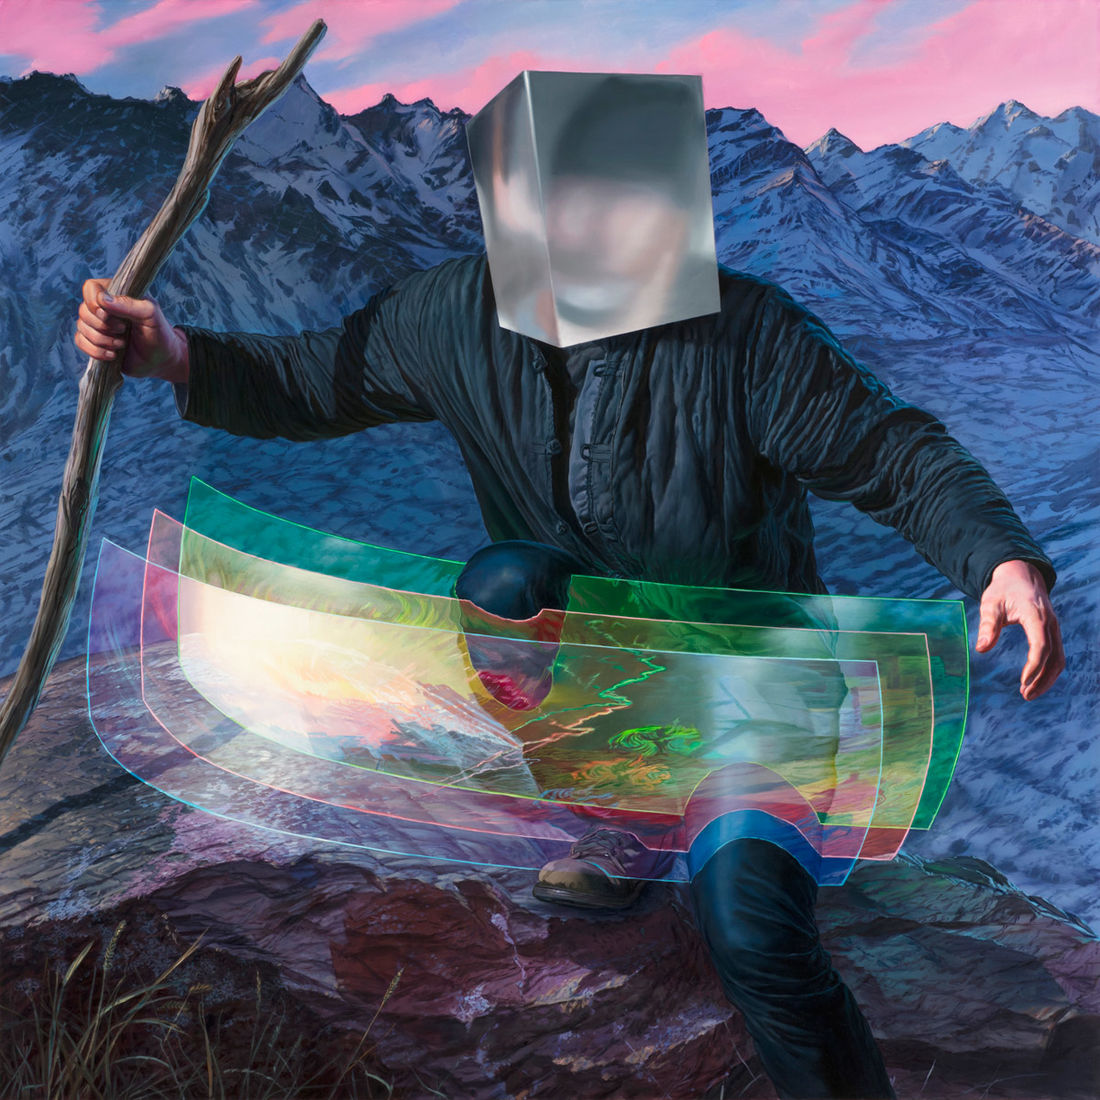 ArtistSpotlightJean-PierreRoy-BOOOOOOOM!-CREATE*INSPIRE*COMMUNITY*ART*DESIGN*MUSIC*FILM*PHOTO*PROJECTS